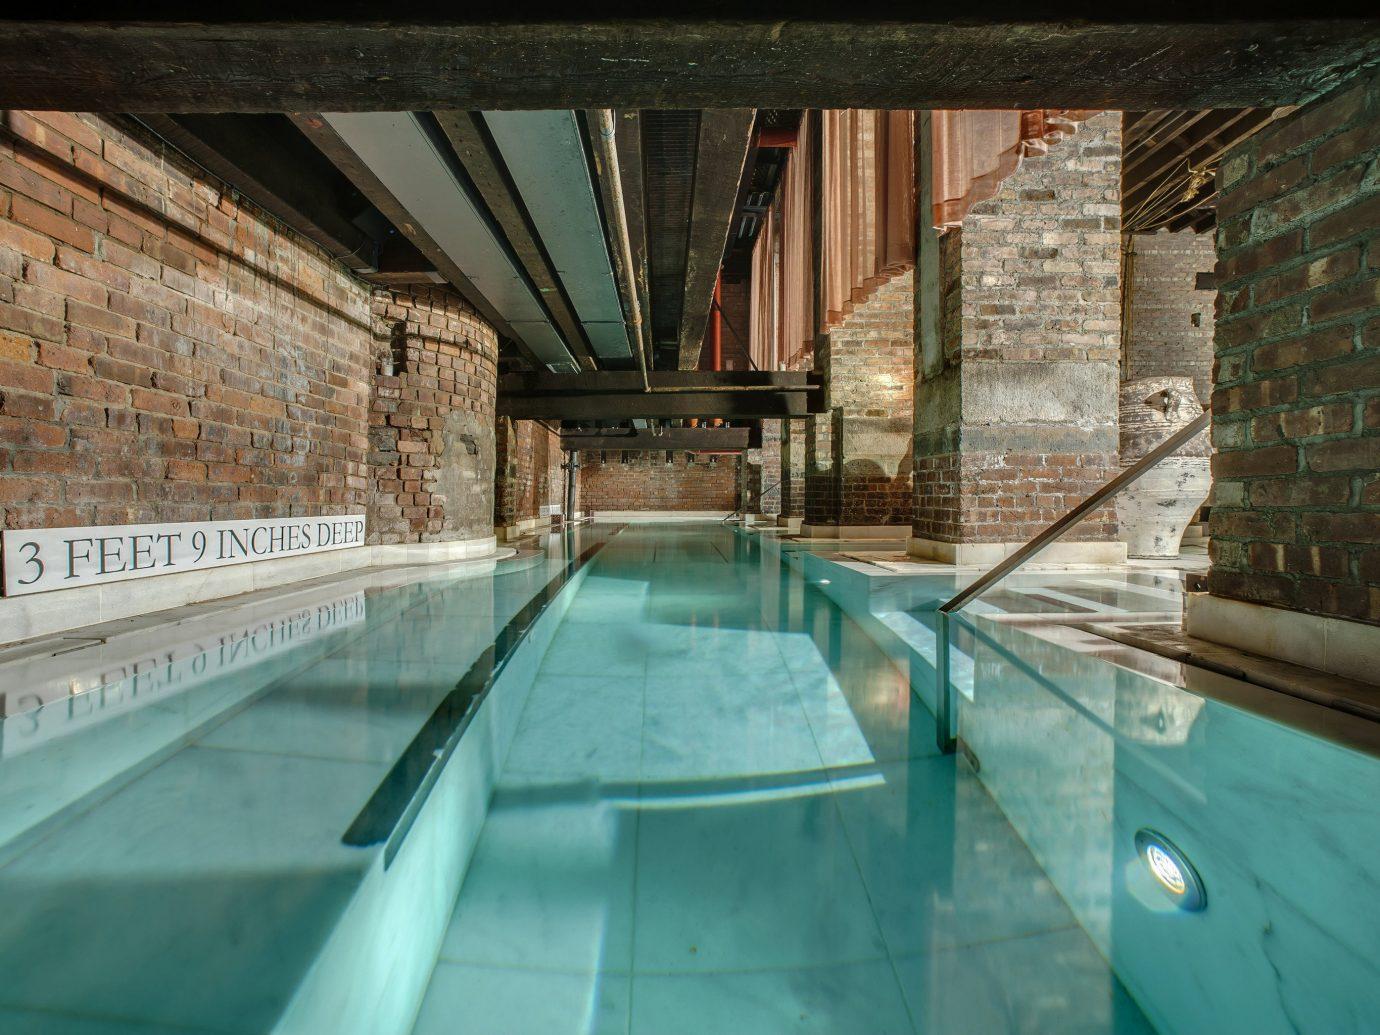 Health + Wellness Spa Retreats Trip Ideas building swimming pool room thermae floor jacuzzi estate stone